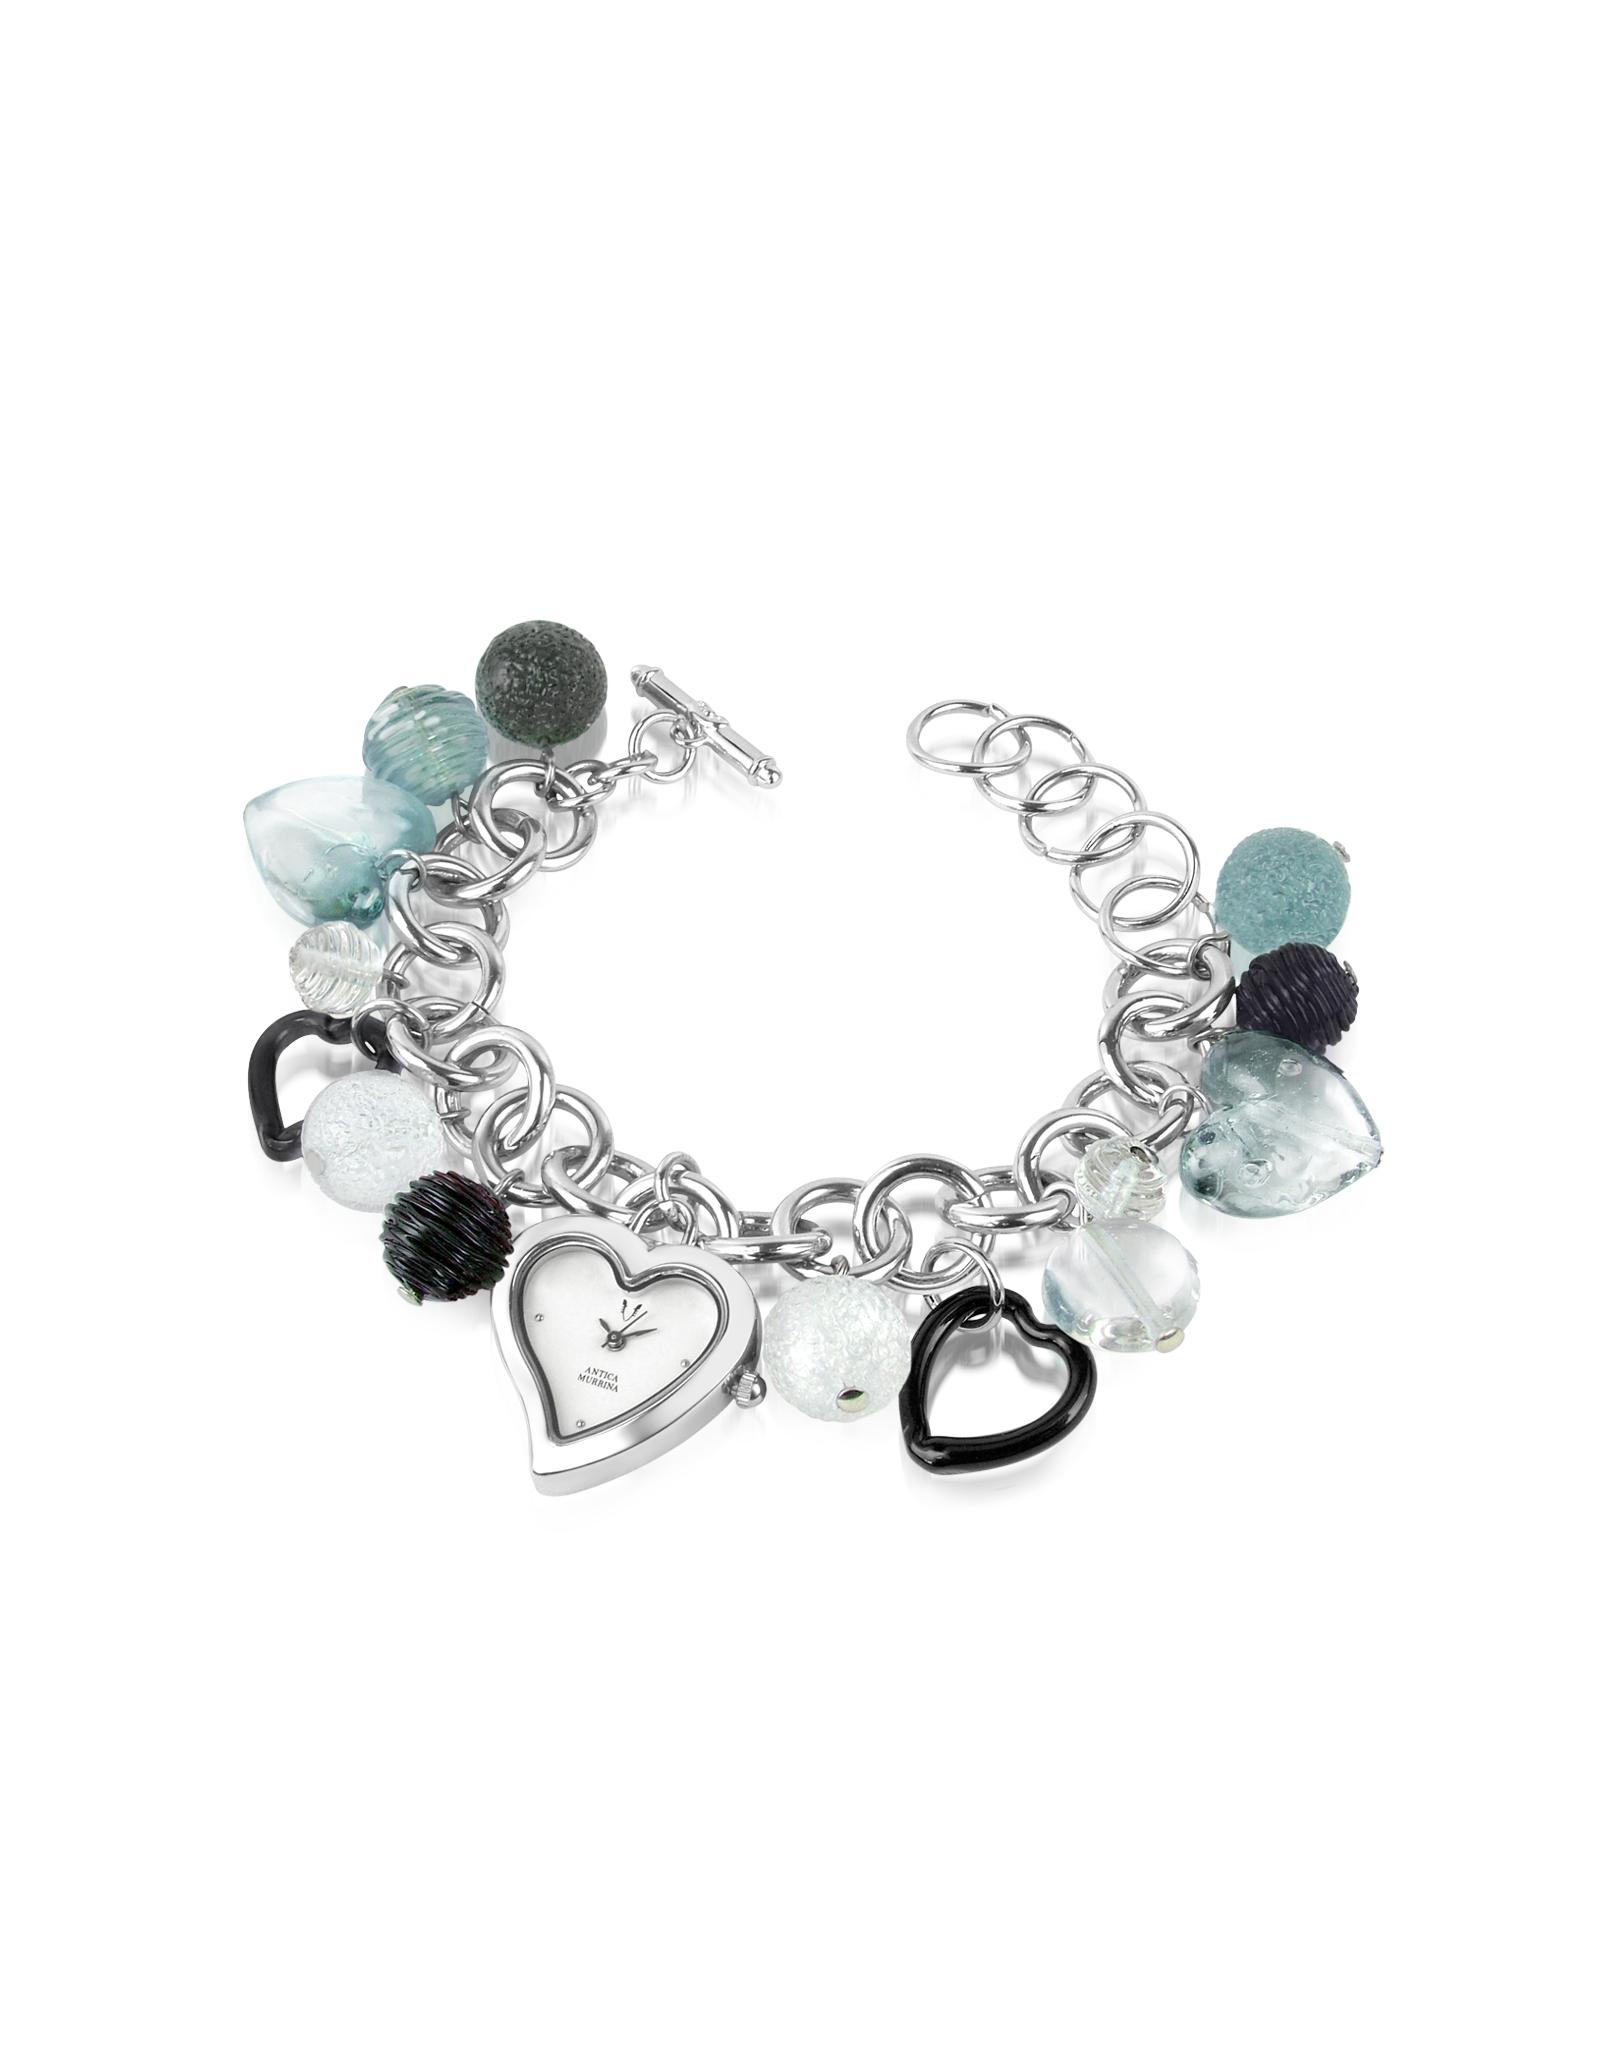 Antica murrina Stardust Murano Glass Heart Charm Bracelet Watch in